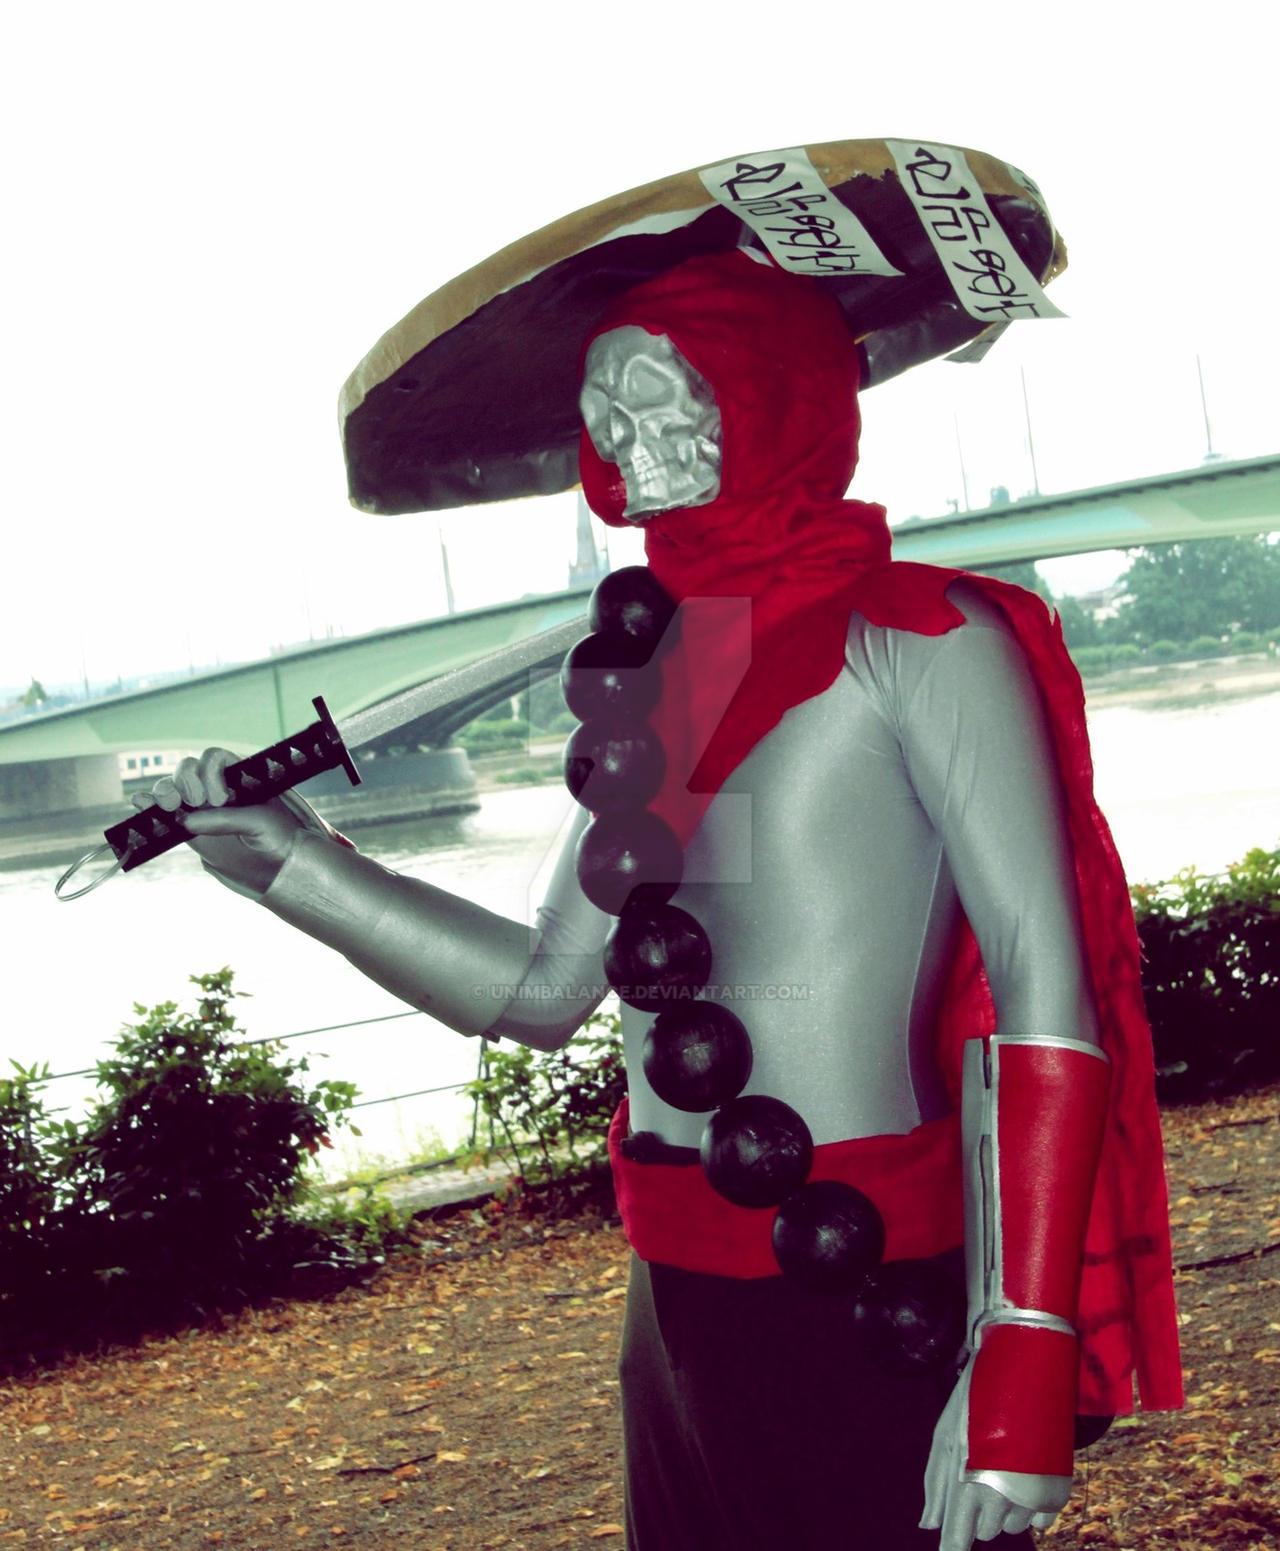 Yoshimitsu Tekken 5 Cosplay I By Unimbalance On Deviantart